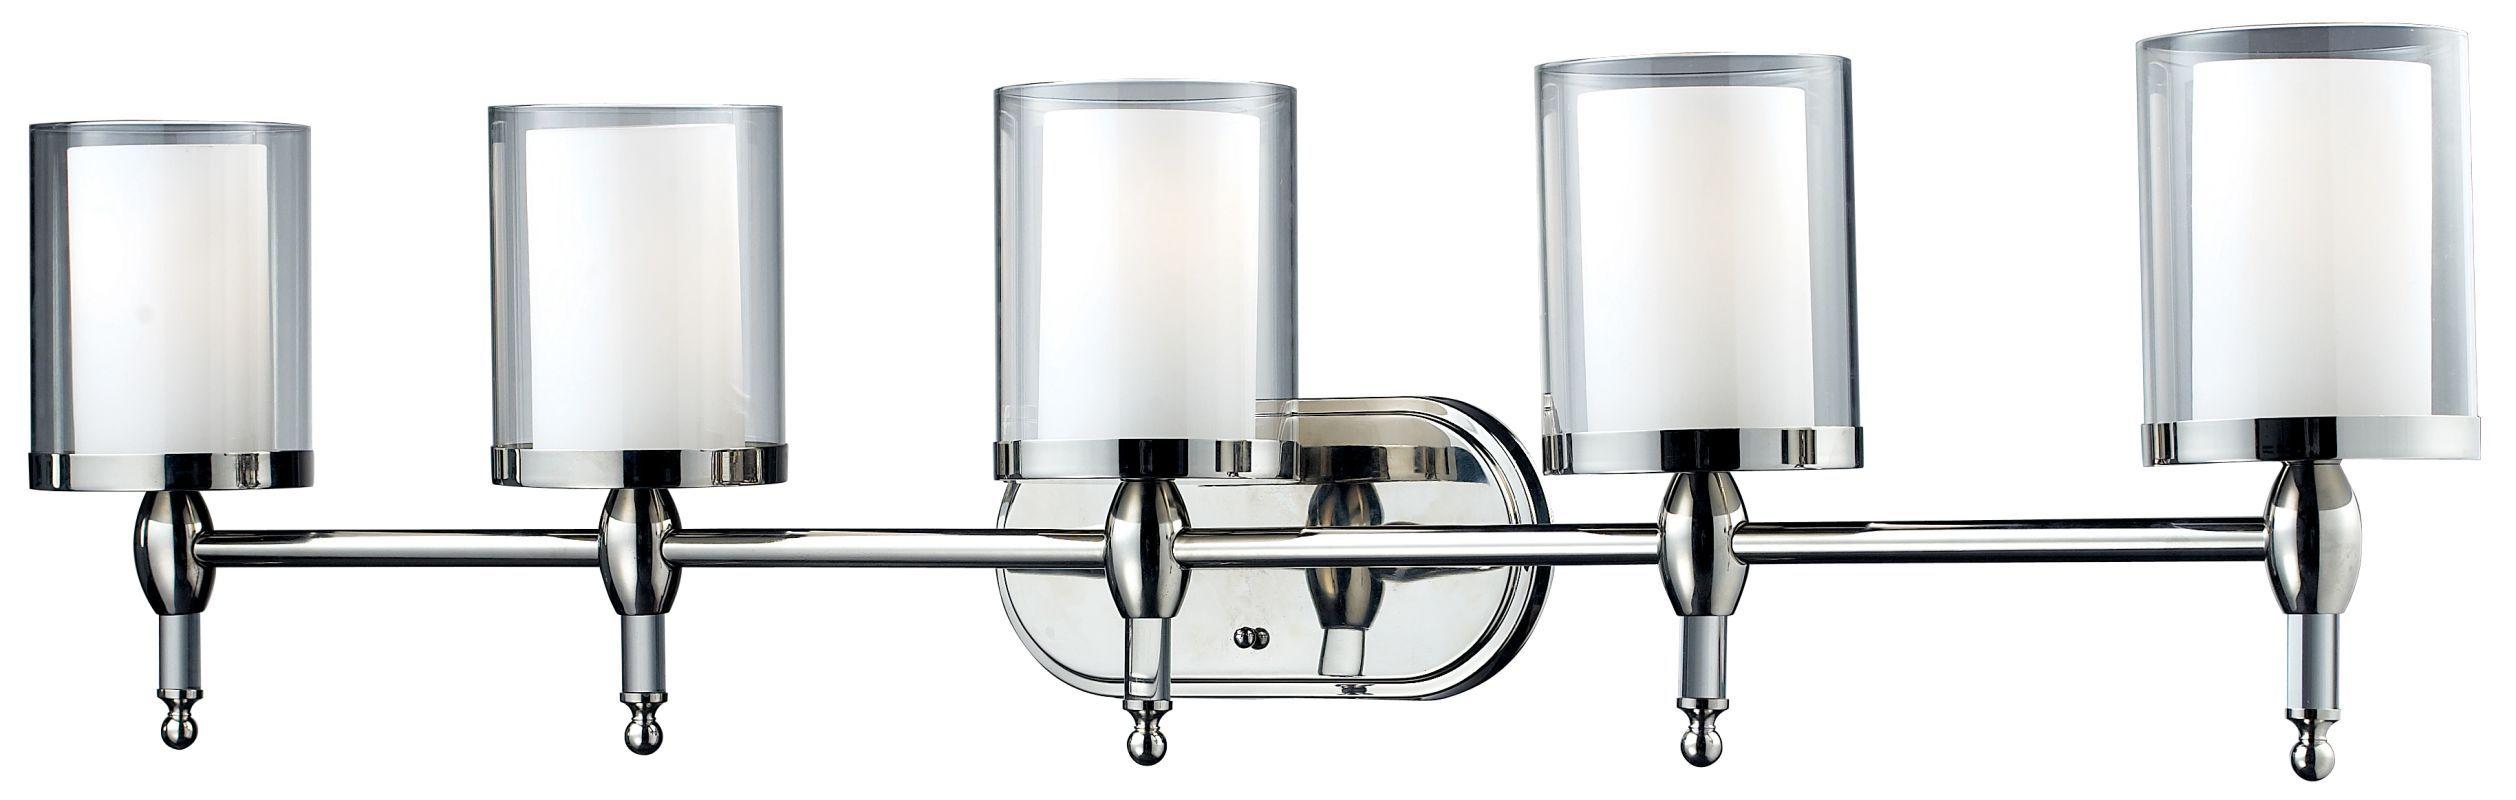 Z-Lite 1908-5V Argenta 5 Light Bathroom Vanity Light with Matte Opal Glass Shade Chrome Indoor Lighting Bathroom Fixtures Vanity Light